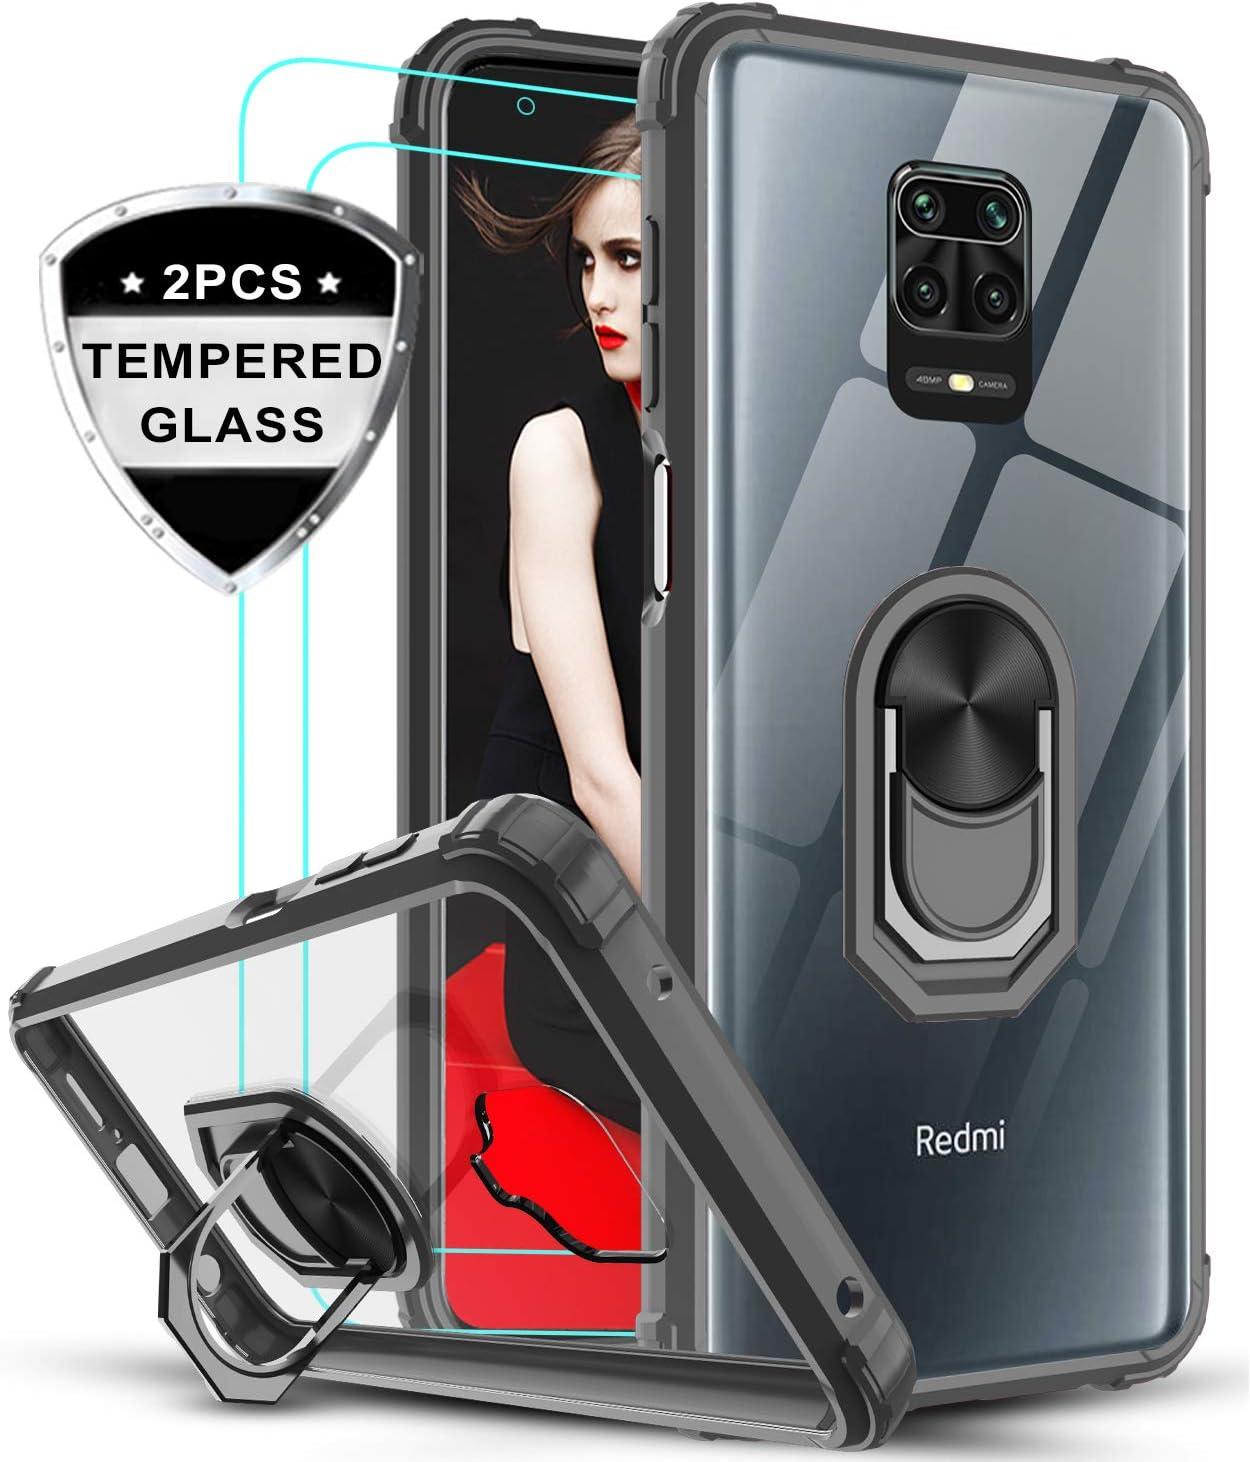 LeYi Funda Xiaomi Redmi Note 9s / Note 9 Pro con [2-Unidades] Cristal Vidrio Templado,Transparente Carcasa con 360 Grados iman Soporte Silicona Bumper Armor Case para Movil Note 9s,Clear Negro